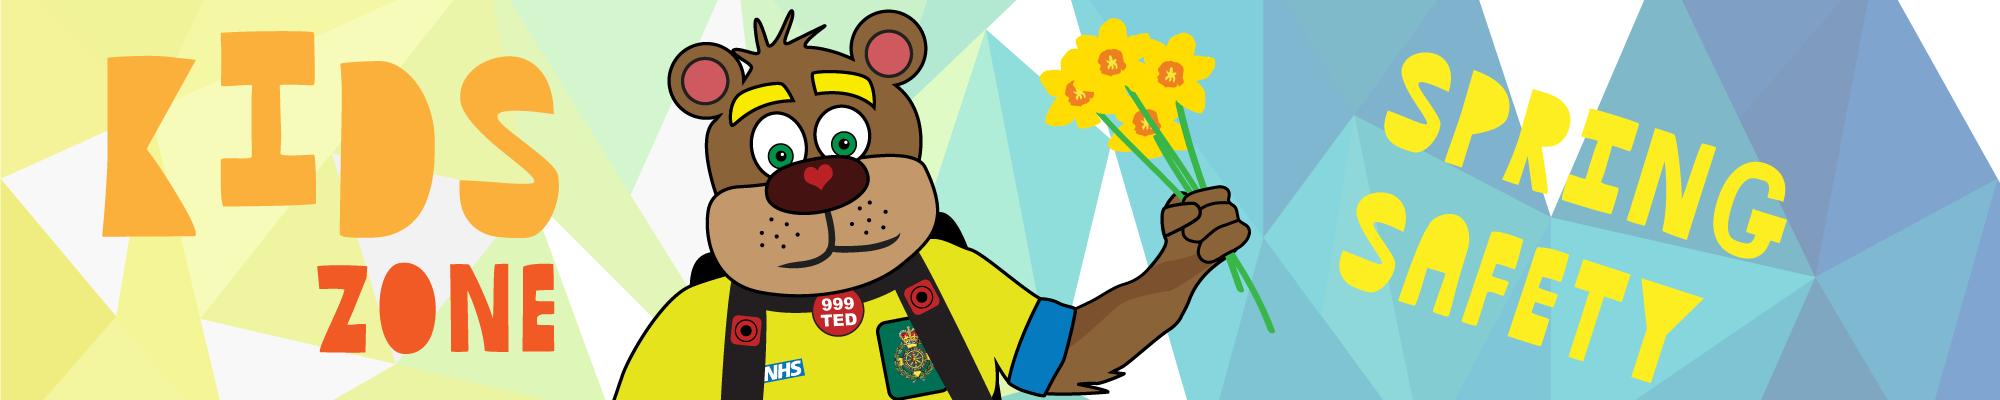 Meet 999 Ted